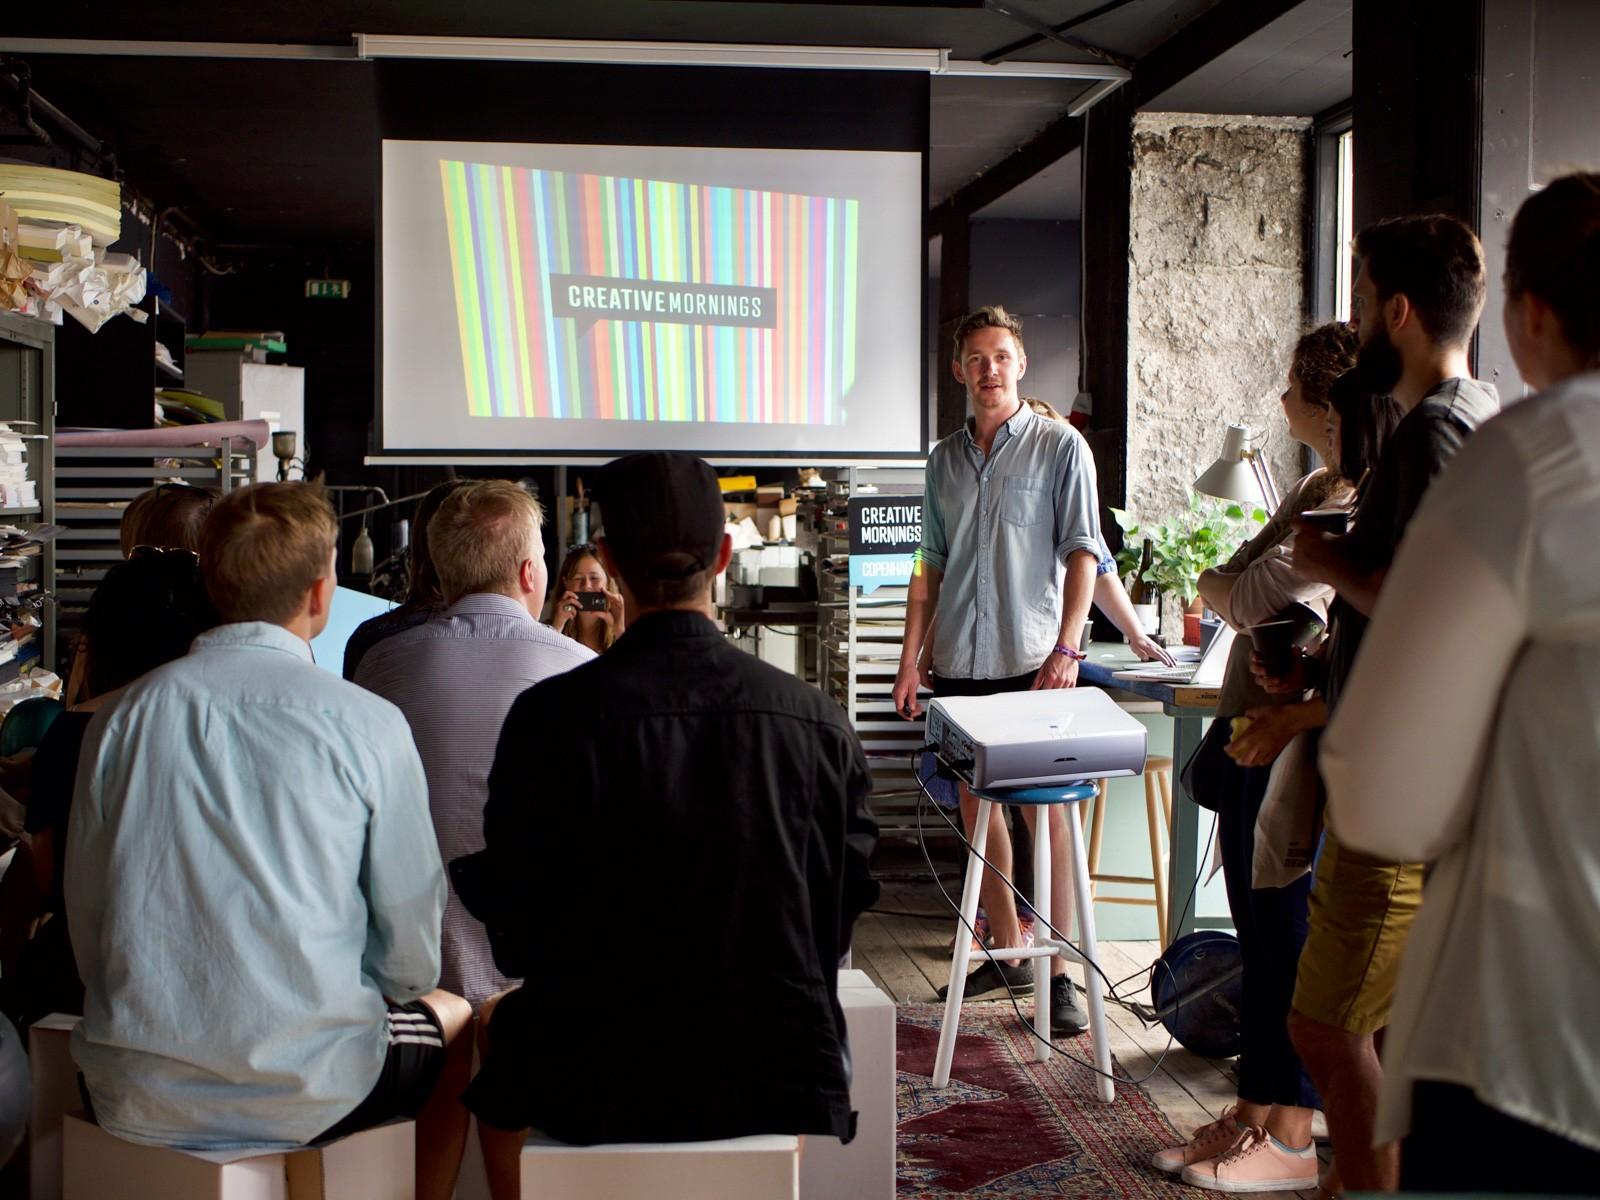 Creative Mornings hos Officin, Hawaii Bio, København